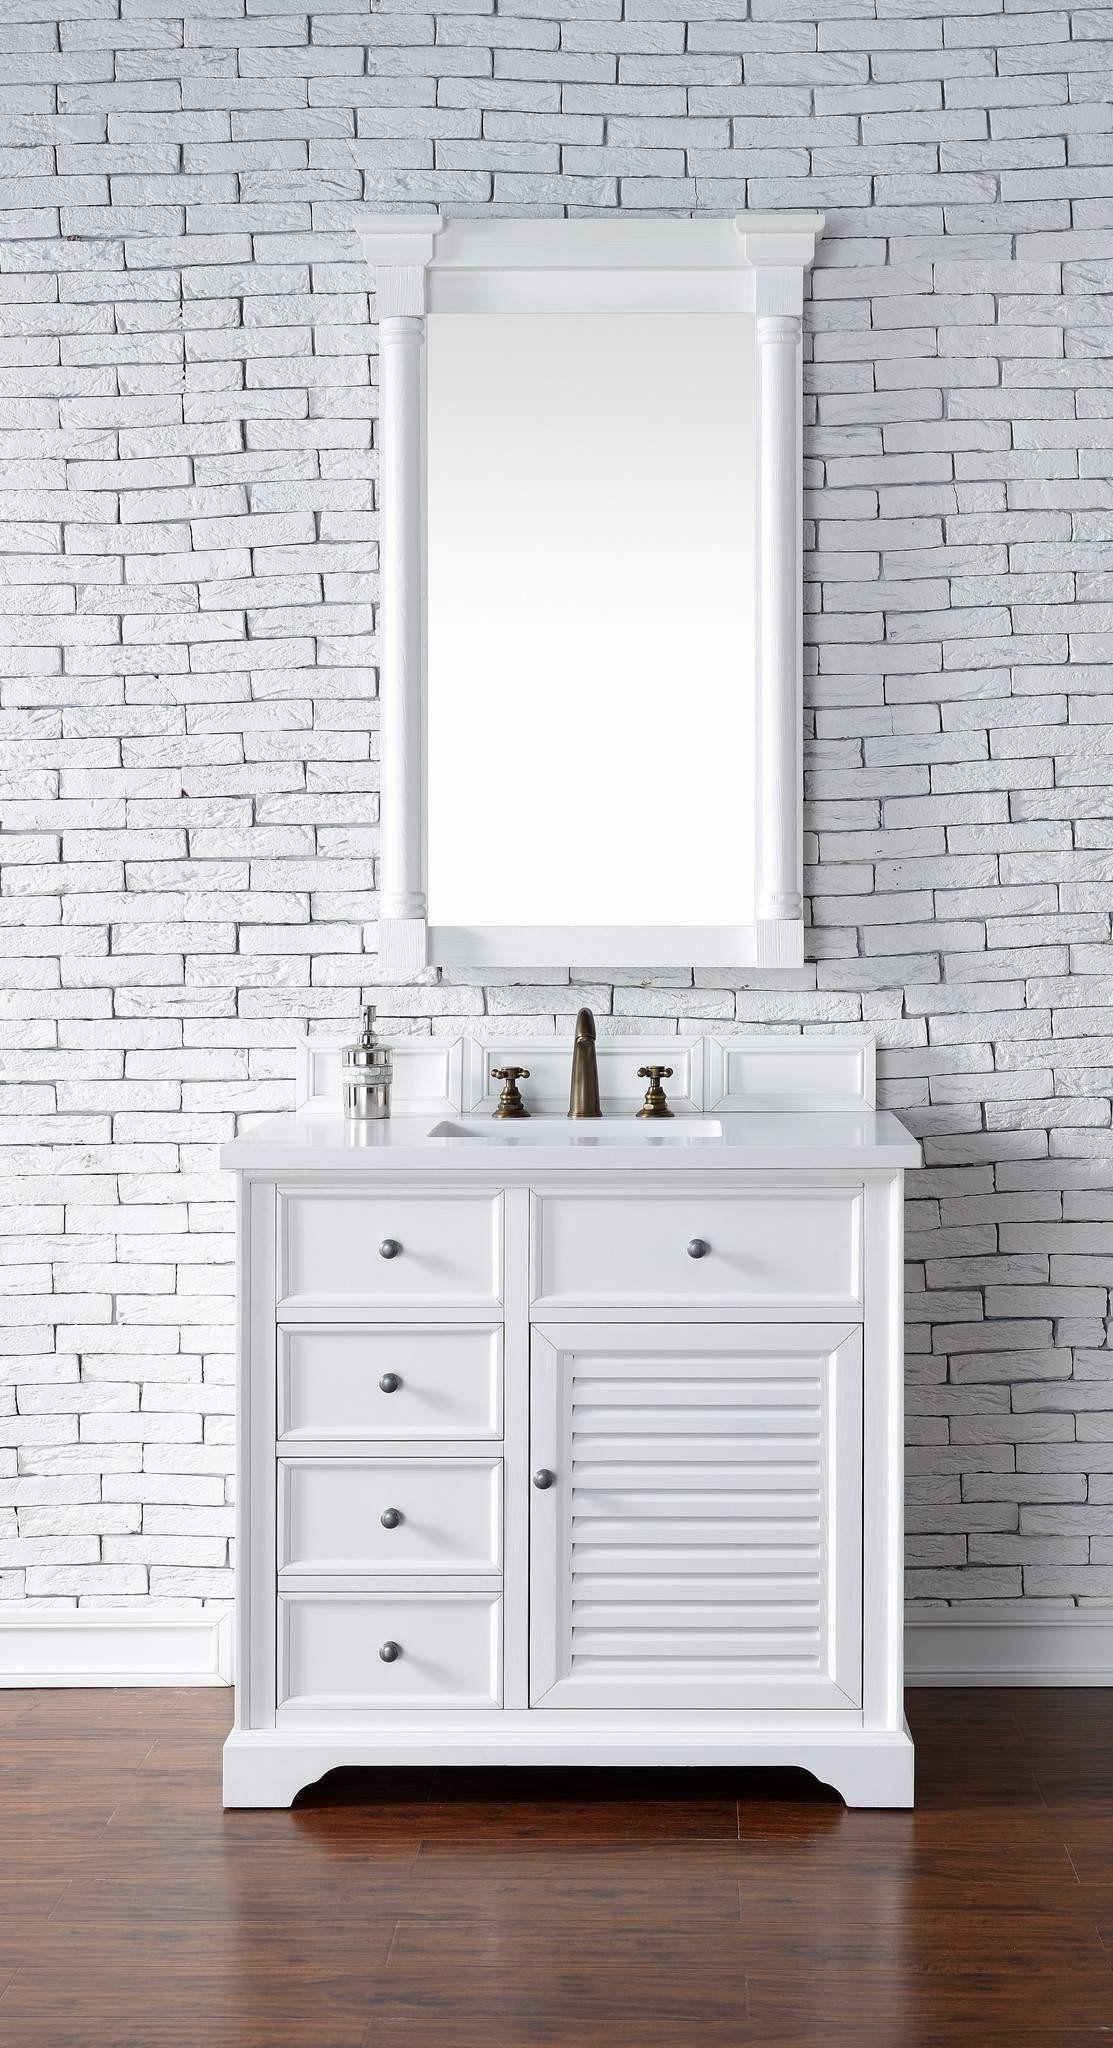 James Martin 238 104 V36 Cwh 3snw Savannah 36 Inch Cottage White Single Vanity With 3 Cm Snow White Quartz Top Small Bathroom Vanities Single Bathroom Vanity White Vanity Bathroom